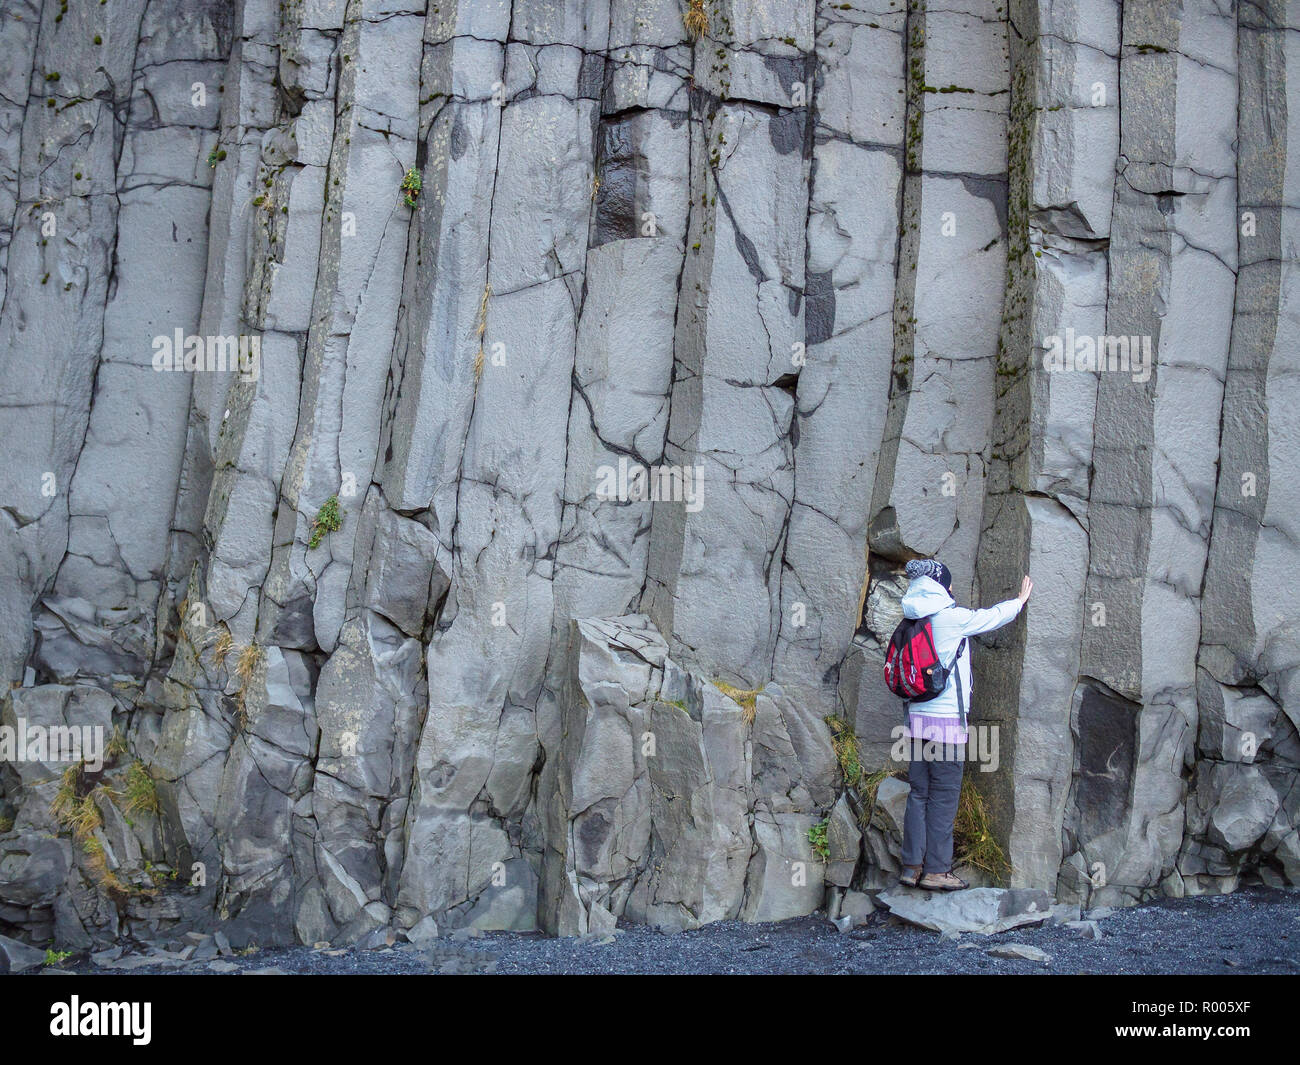 Tourist girl at stacks of basalt rock on the cliffline Reynisfjall, Iceland - Stock Image